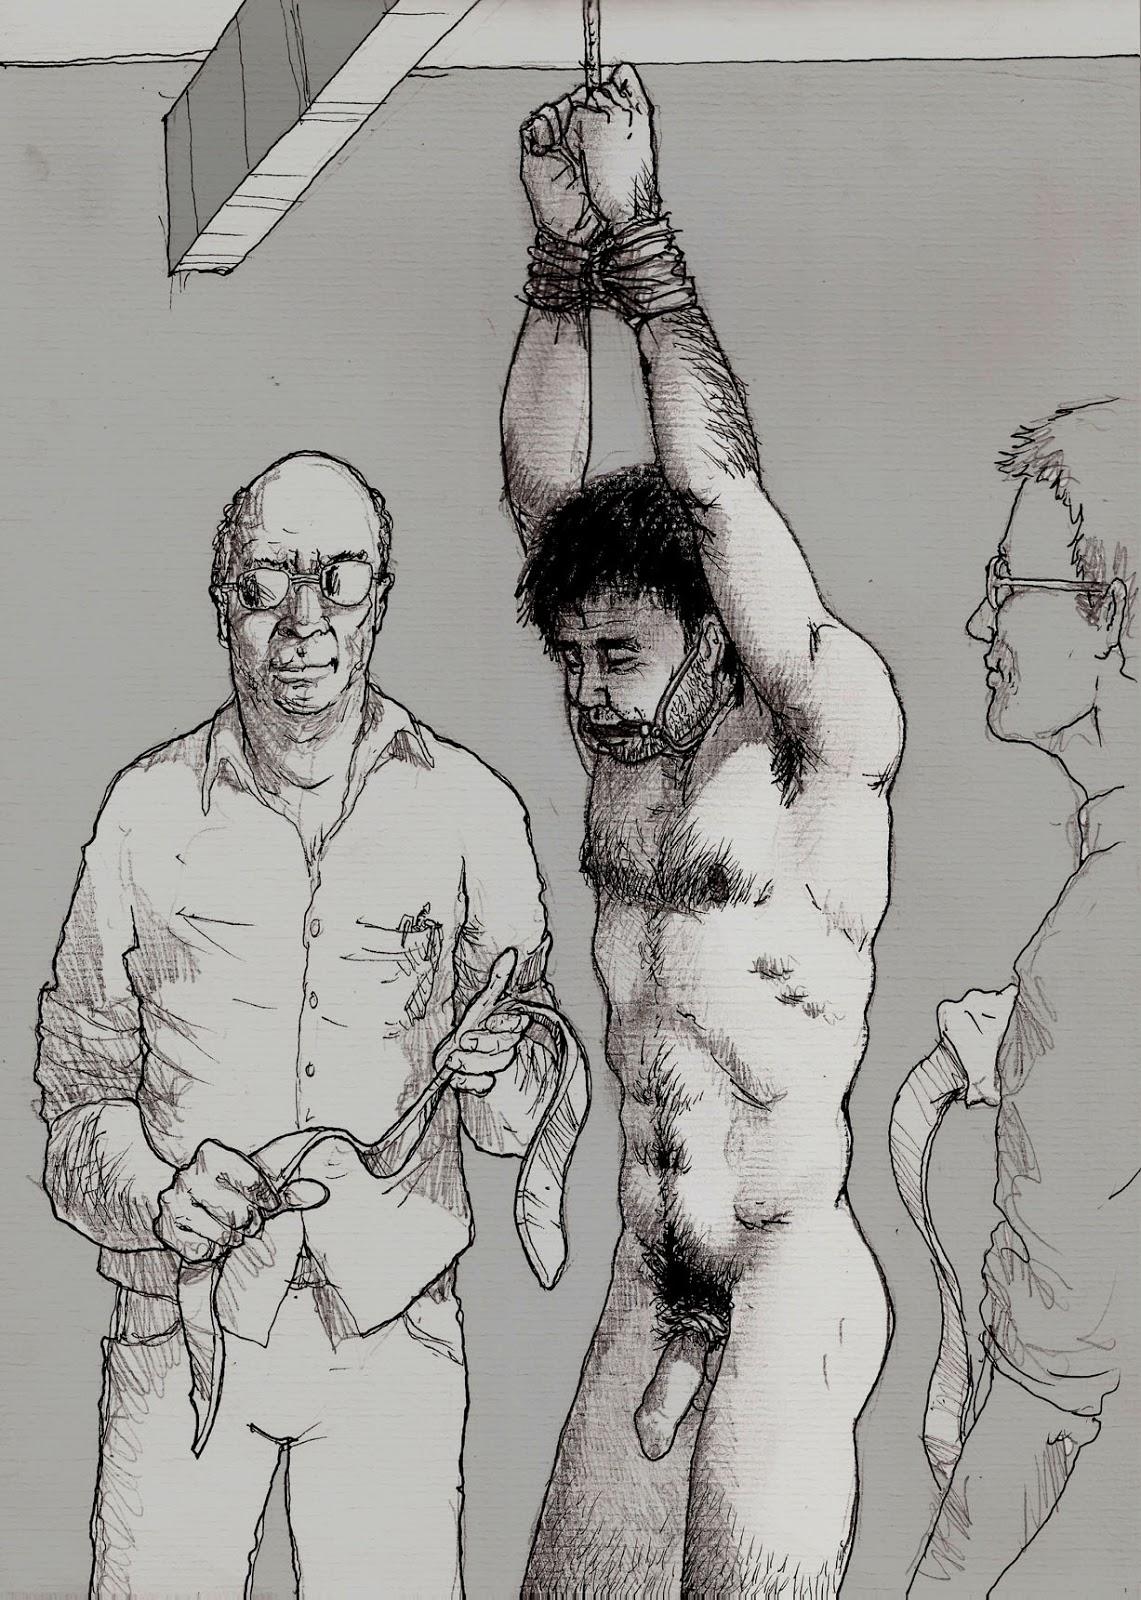 Nude young boys medical examination gay